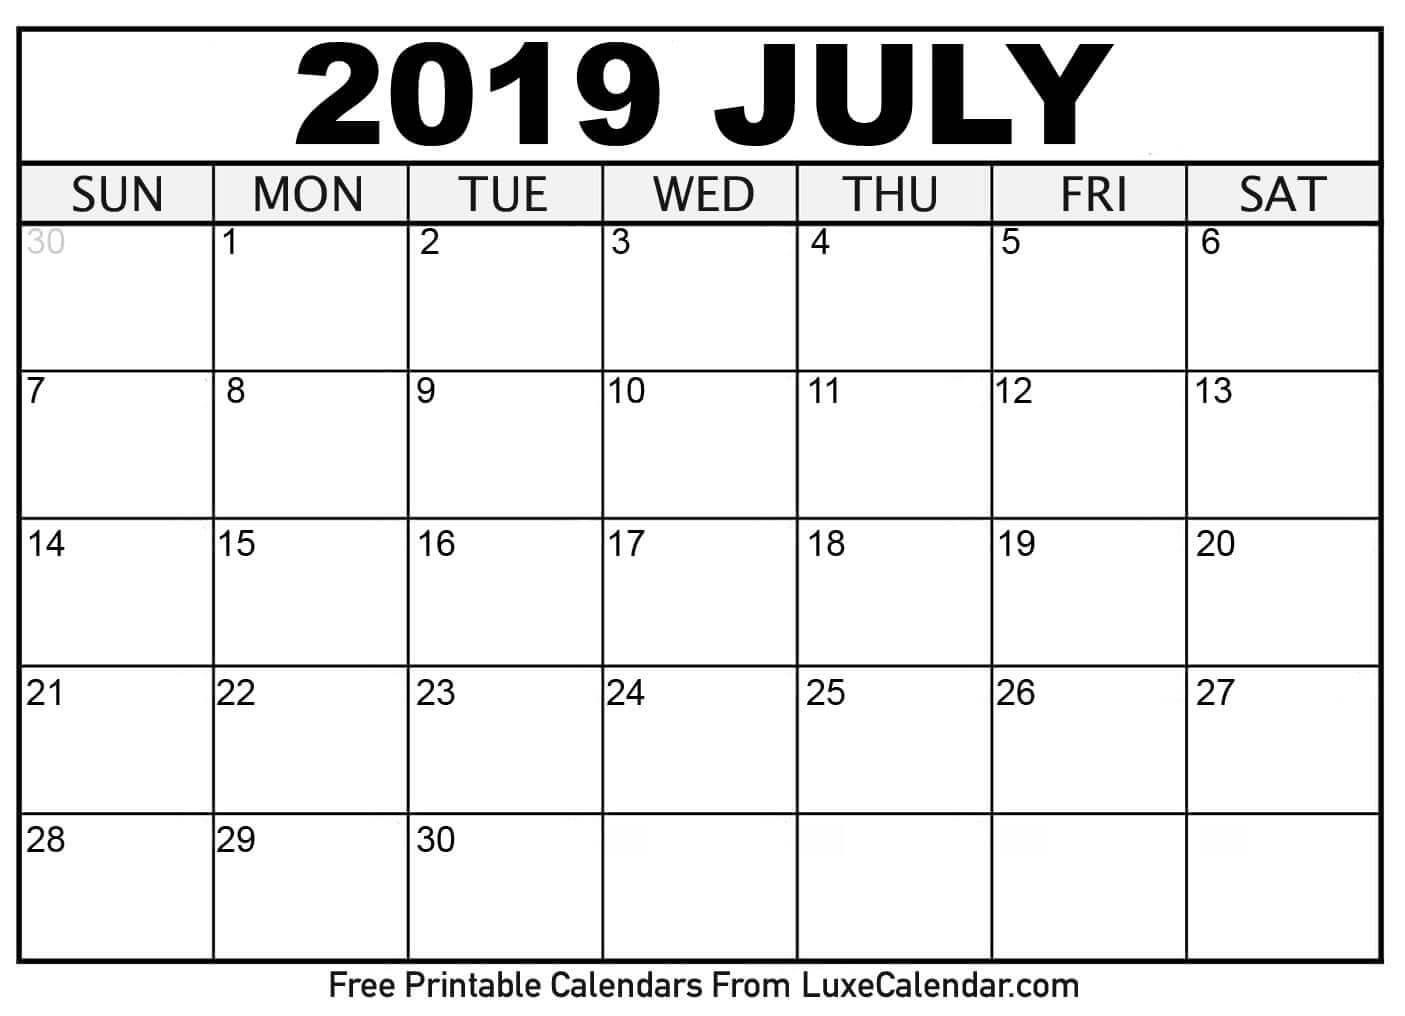 Blank July 2019 Printable Calendar Luxe Calendar